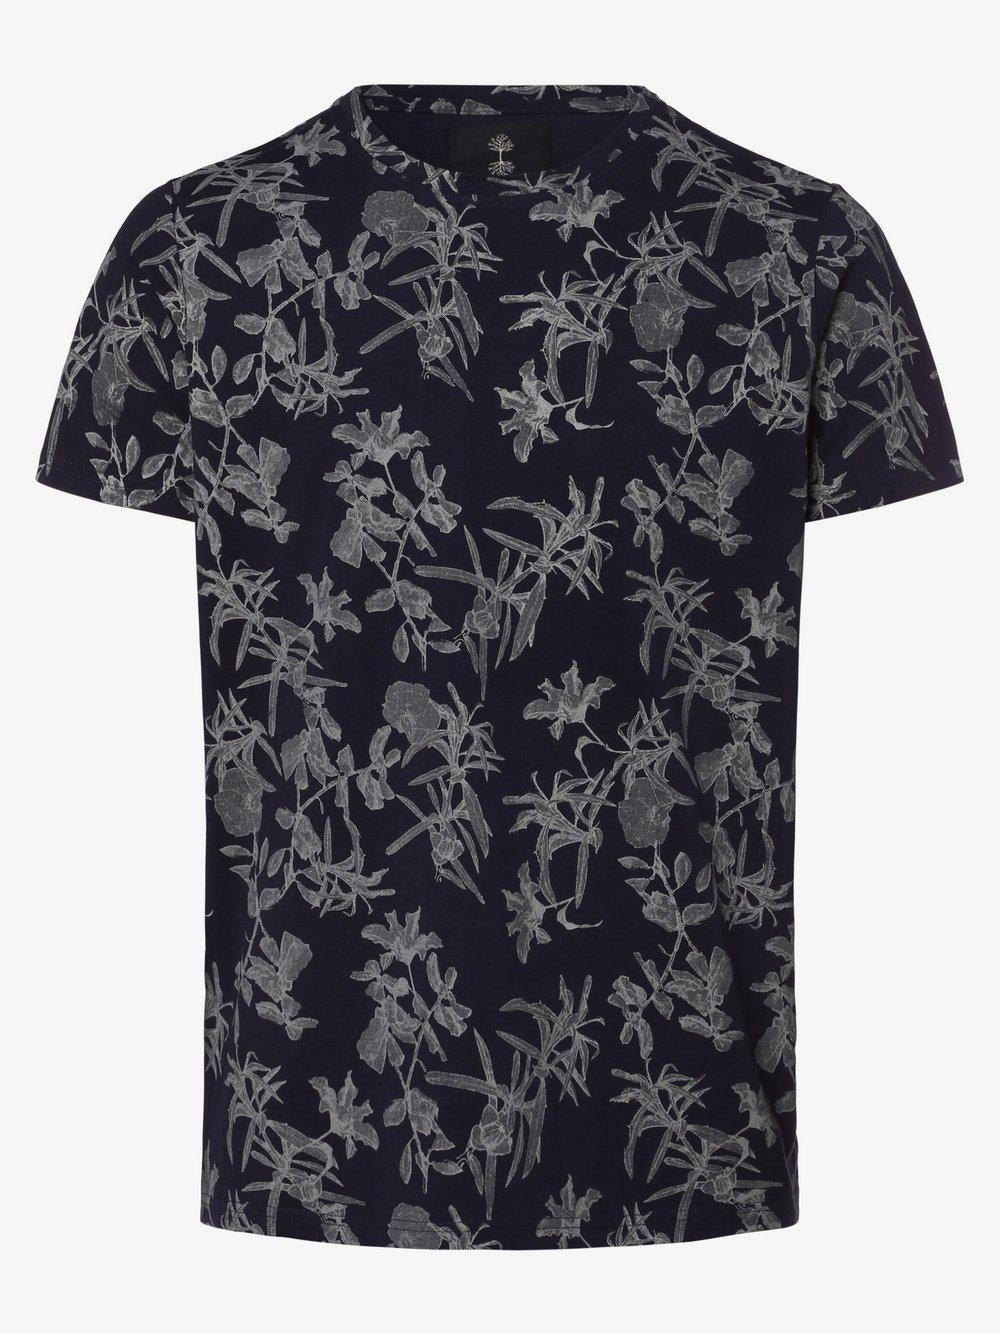 nerve – T-shirt męski – NEJannik, niebieski Van Graaf 477810-0001